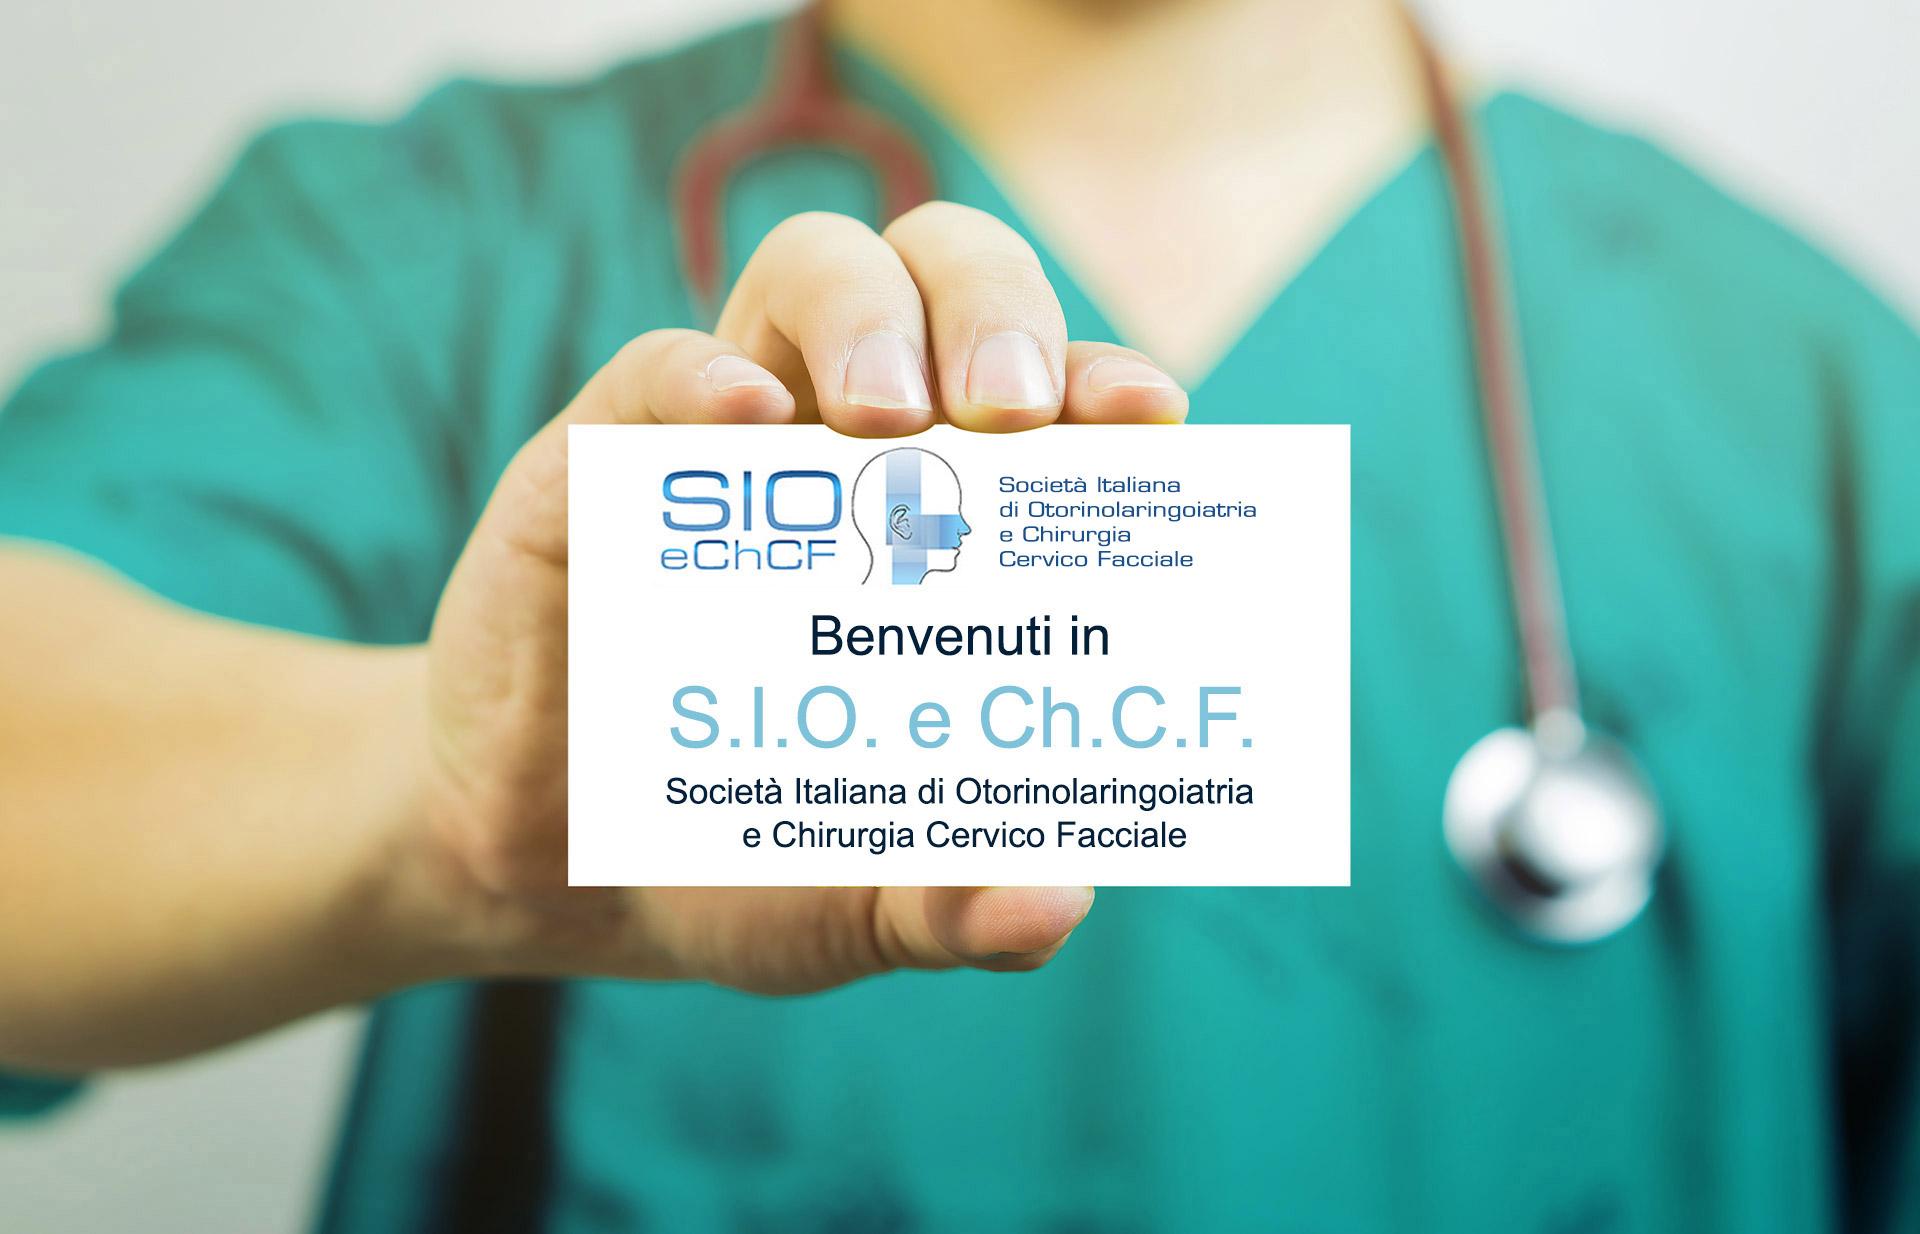 slider2-image-sioechcf-Otorinolaringoiatria2018